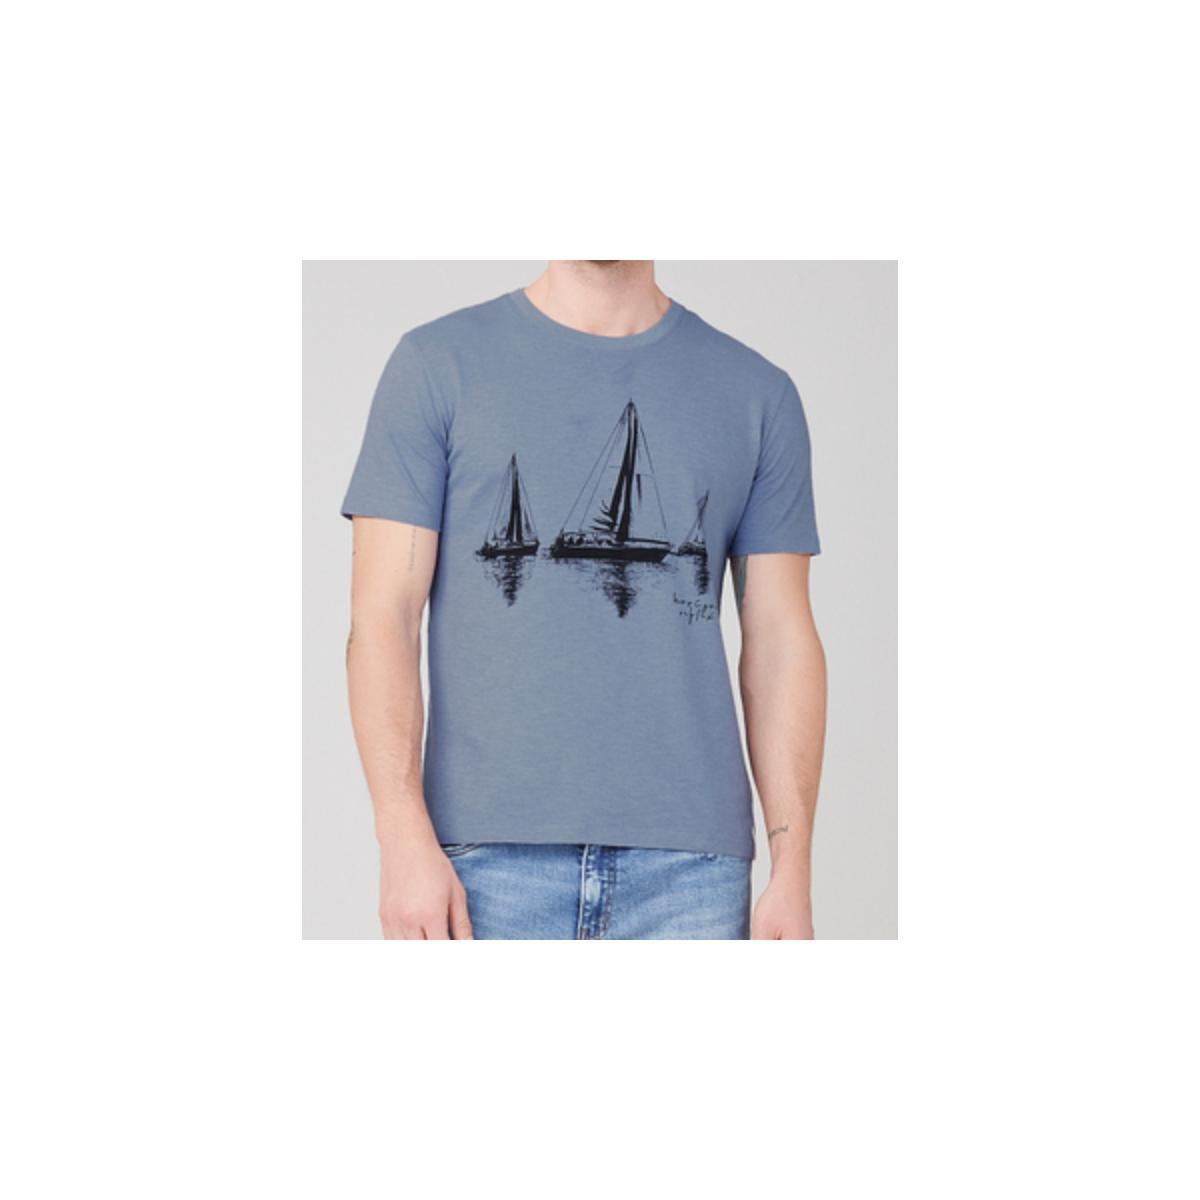 Camiseta Masculina Dzarm 6r7m  Az3en Azul